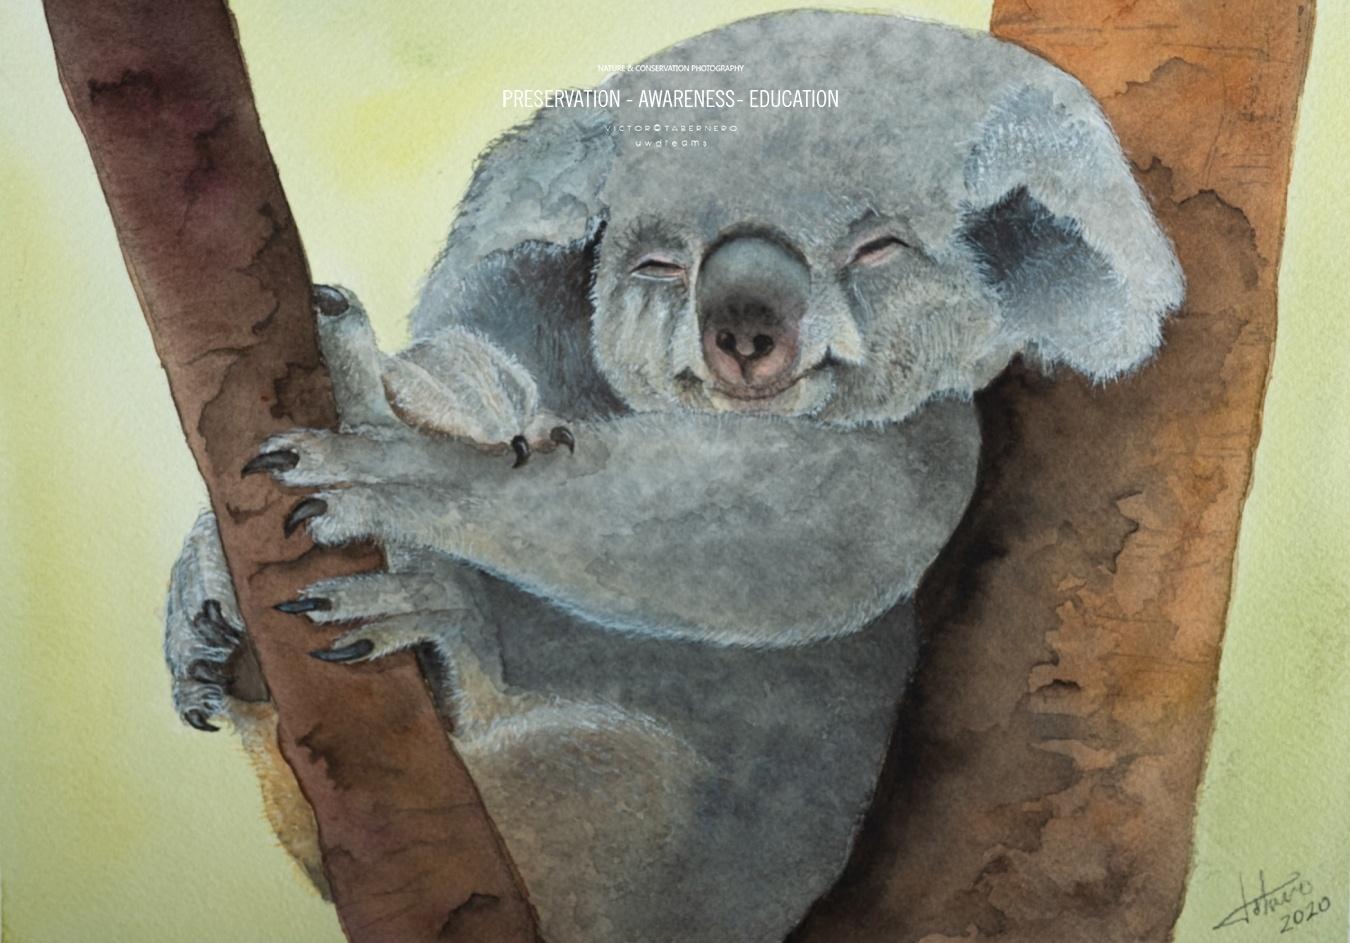 Koala - 31x23cm - Vida Salvaje - Wildlife Conservation Photography, UWDREAMS.COM